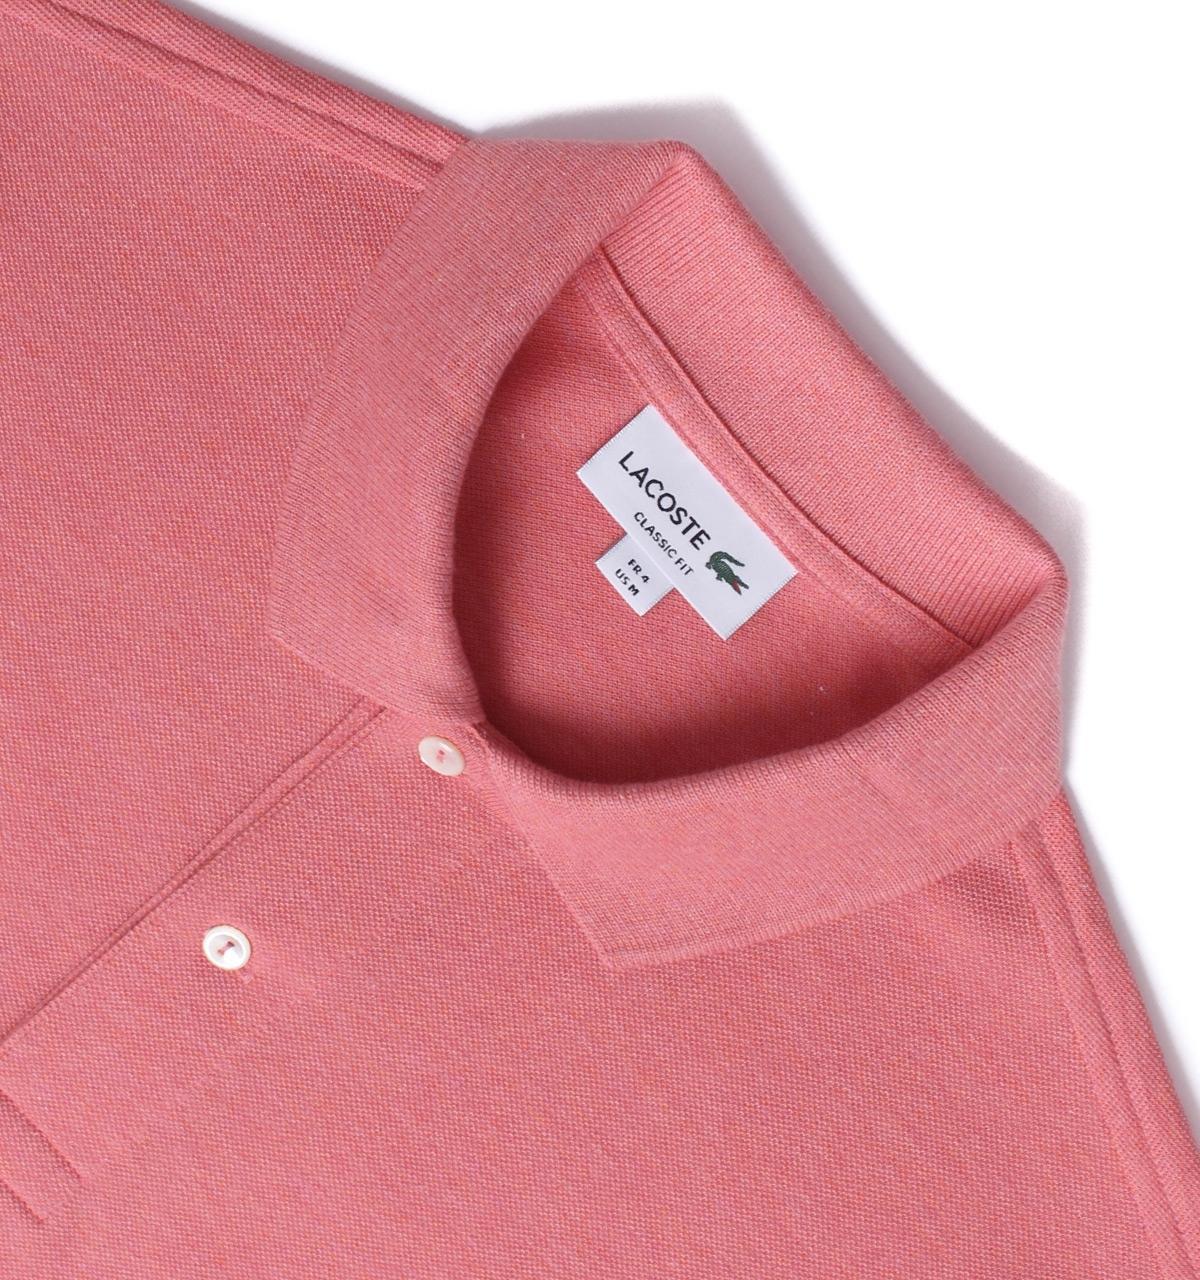 1dc917e8f330e Lacoste - Rosa Pink Marl Classic Fit Pique Polo Shirt for Men - Lyst. View  fullscreen